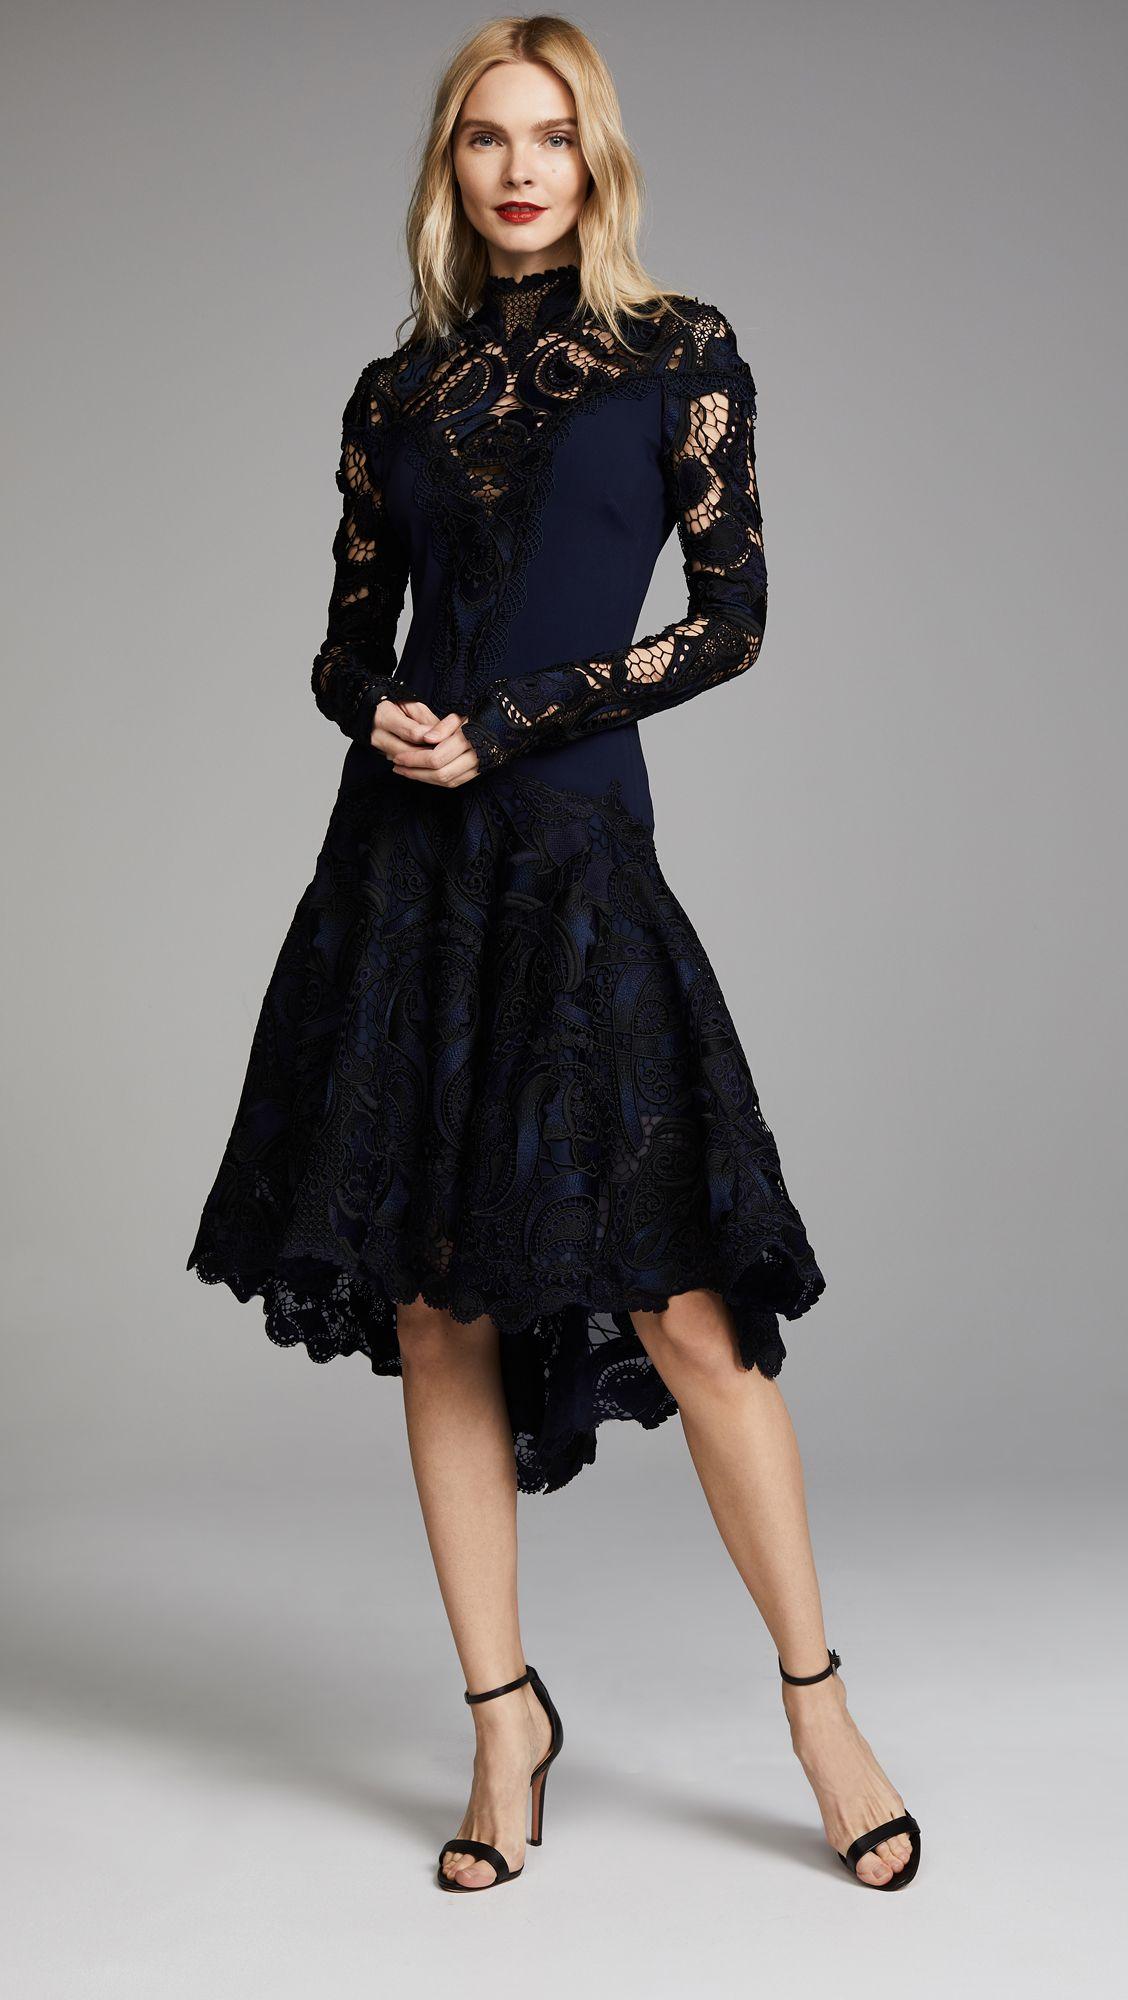 Crepe Applique Long Sleeve Trumpet Dress Long black